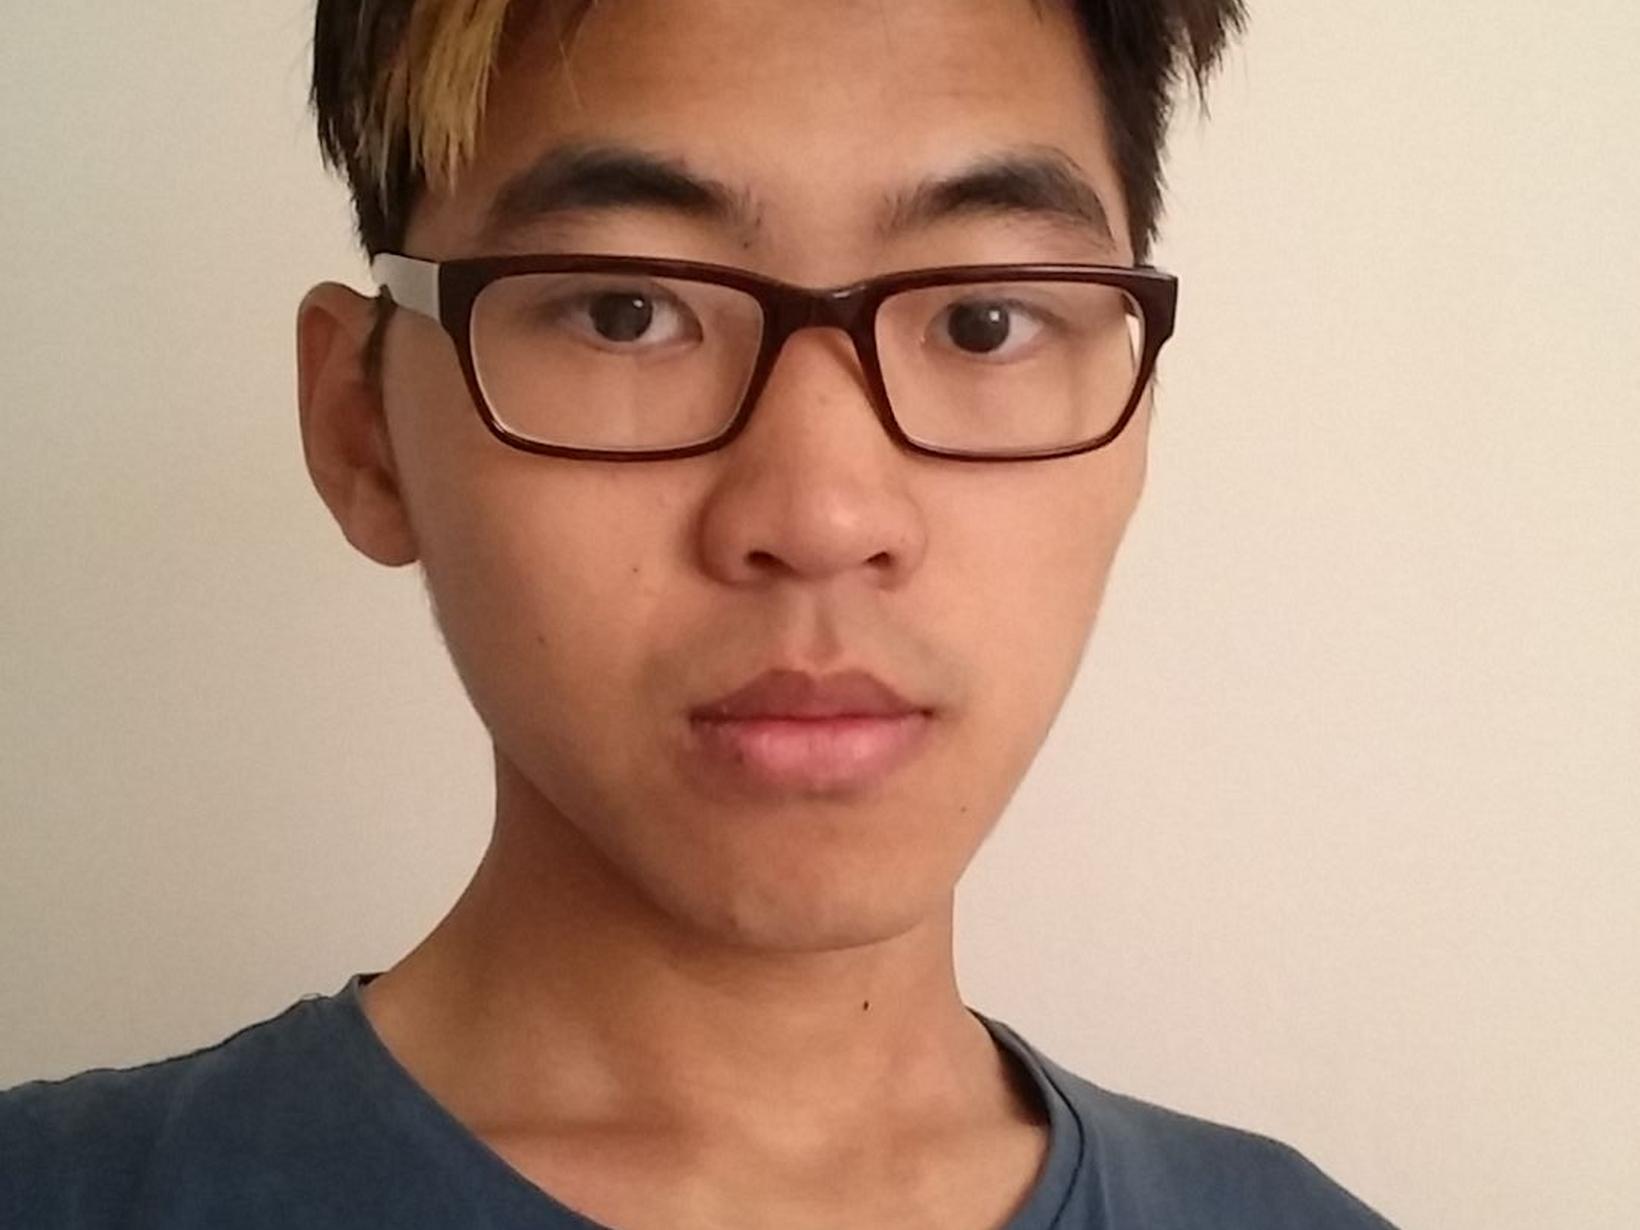 Shangkun from Leeds, United Kingdom